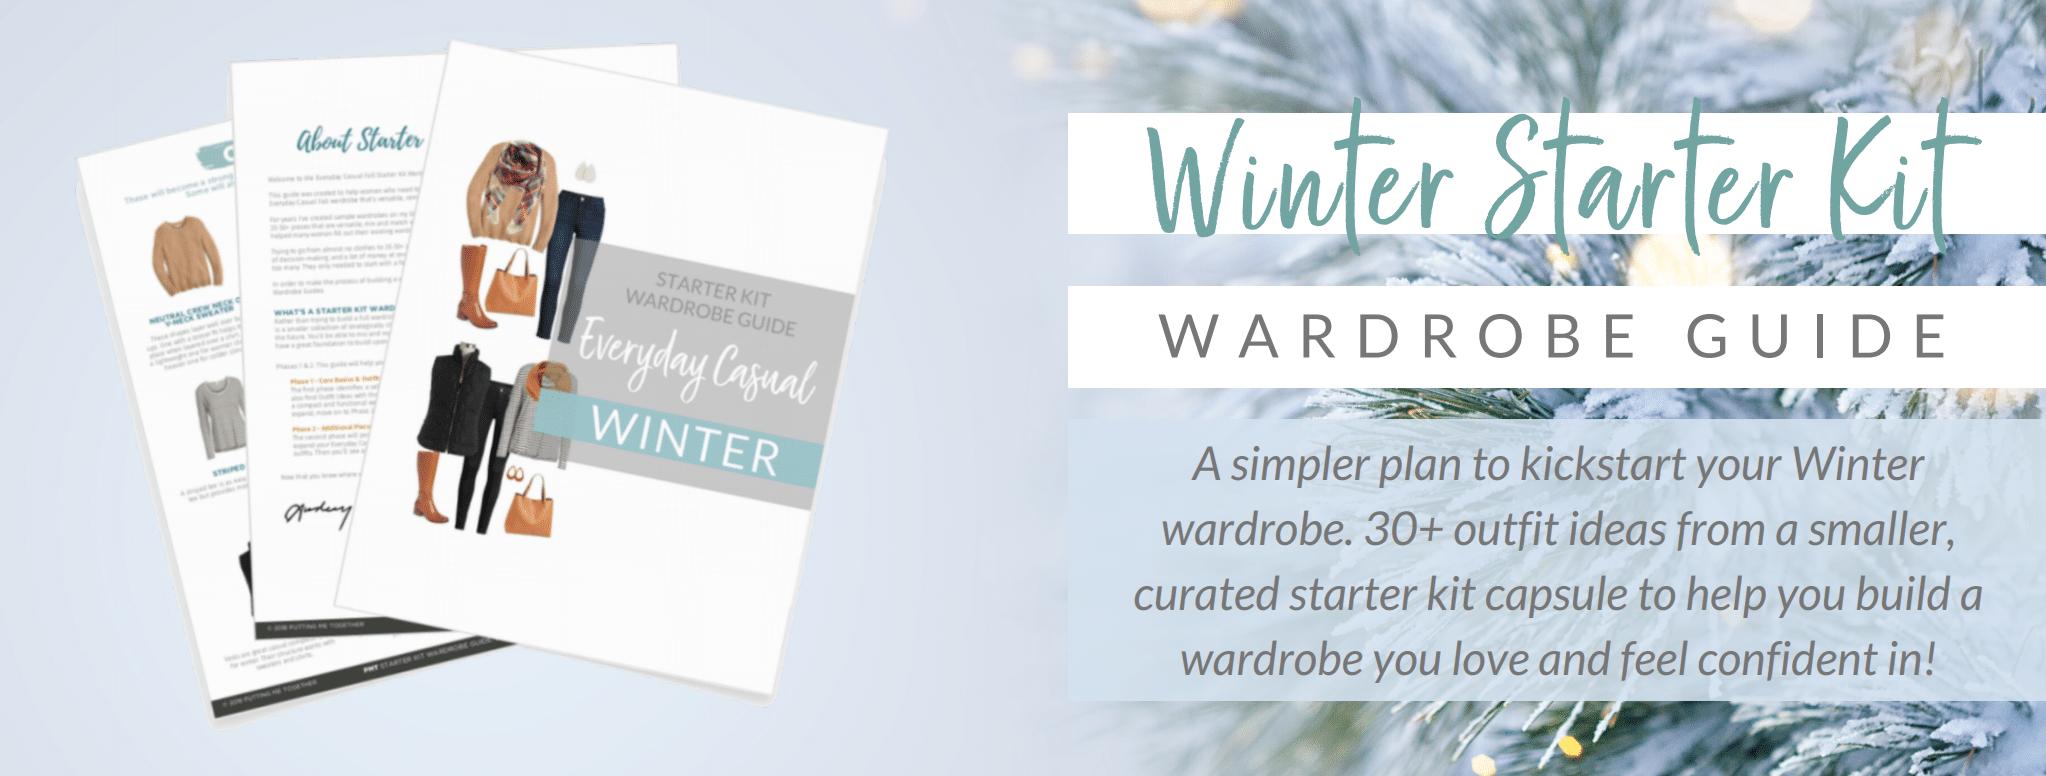 Winter Starter Kit Wardrobe Guide